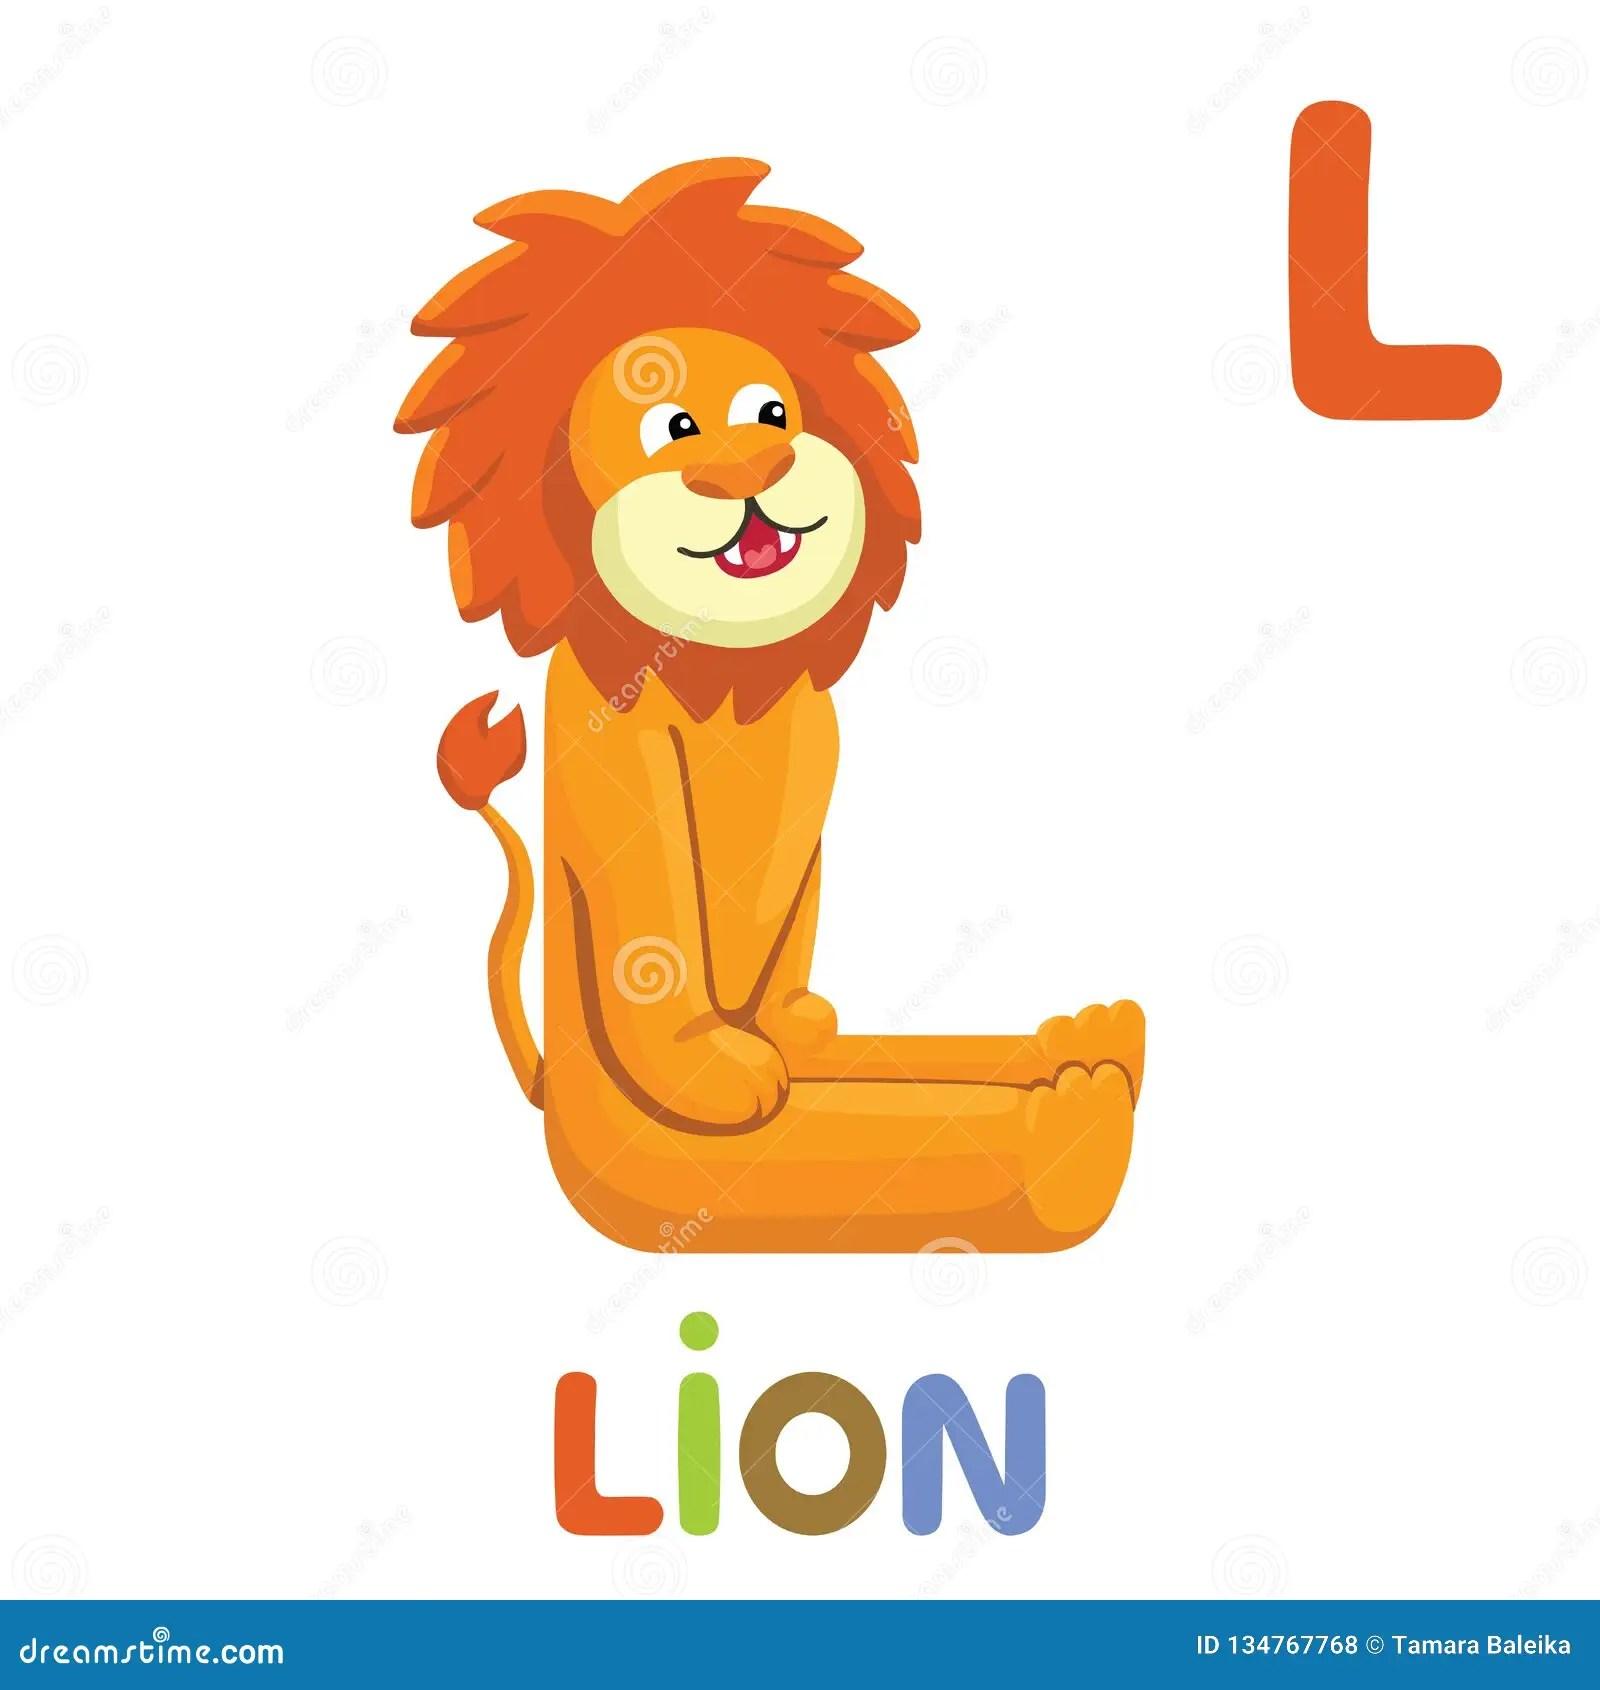 L Is For Lion Letter L Lion Cute Illustration Animal